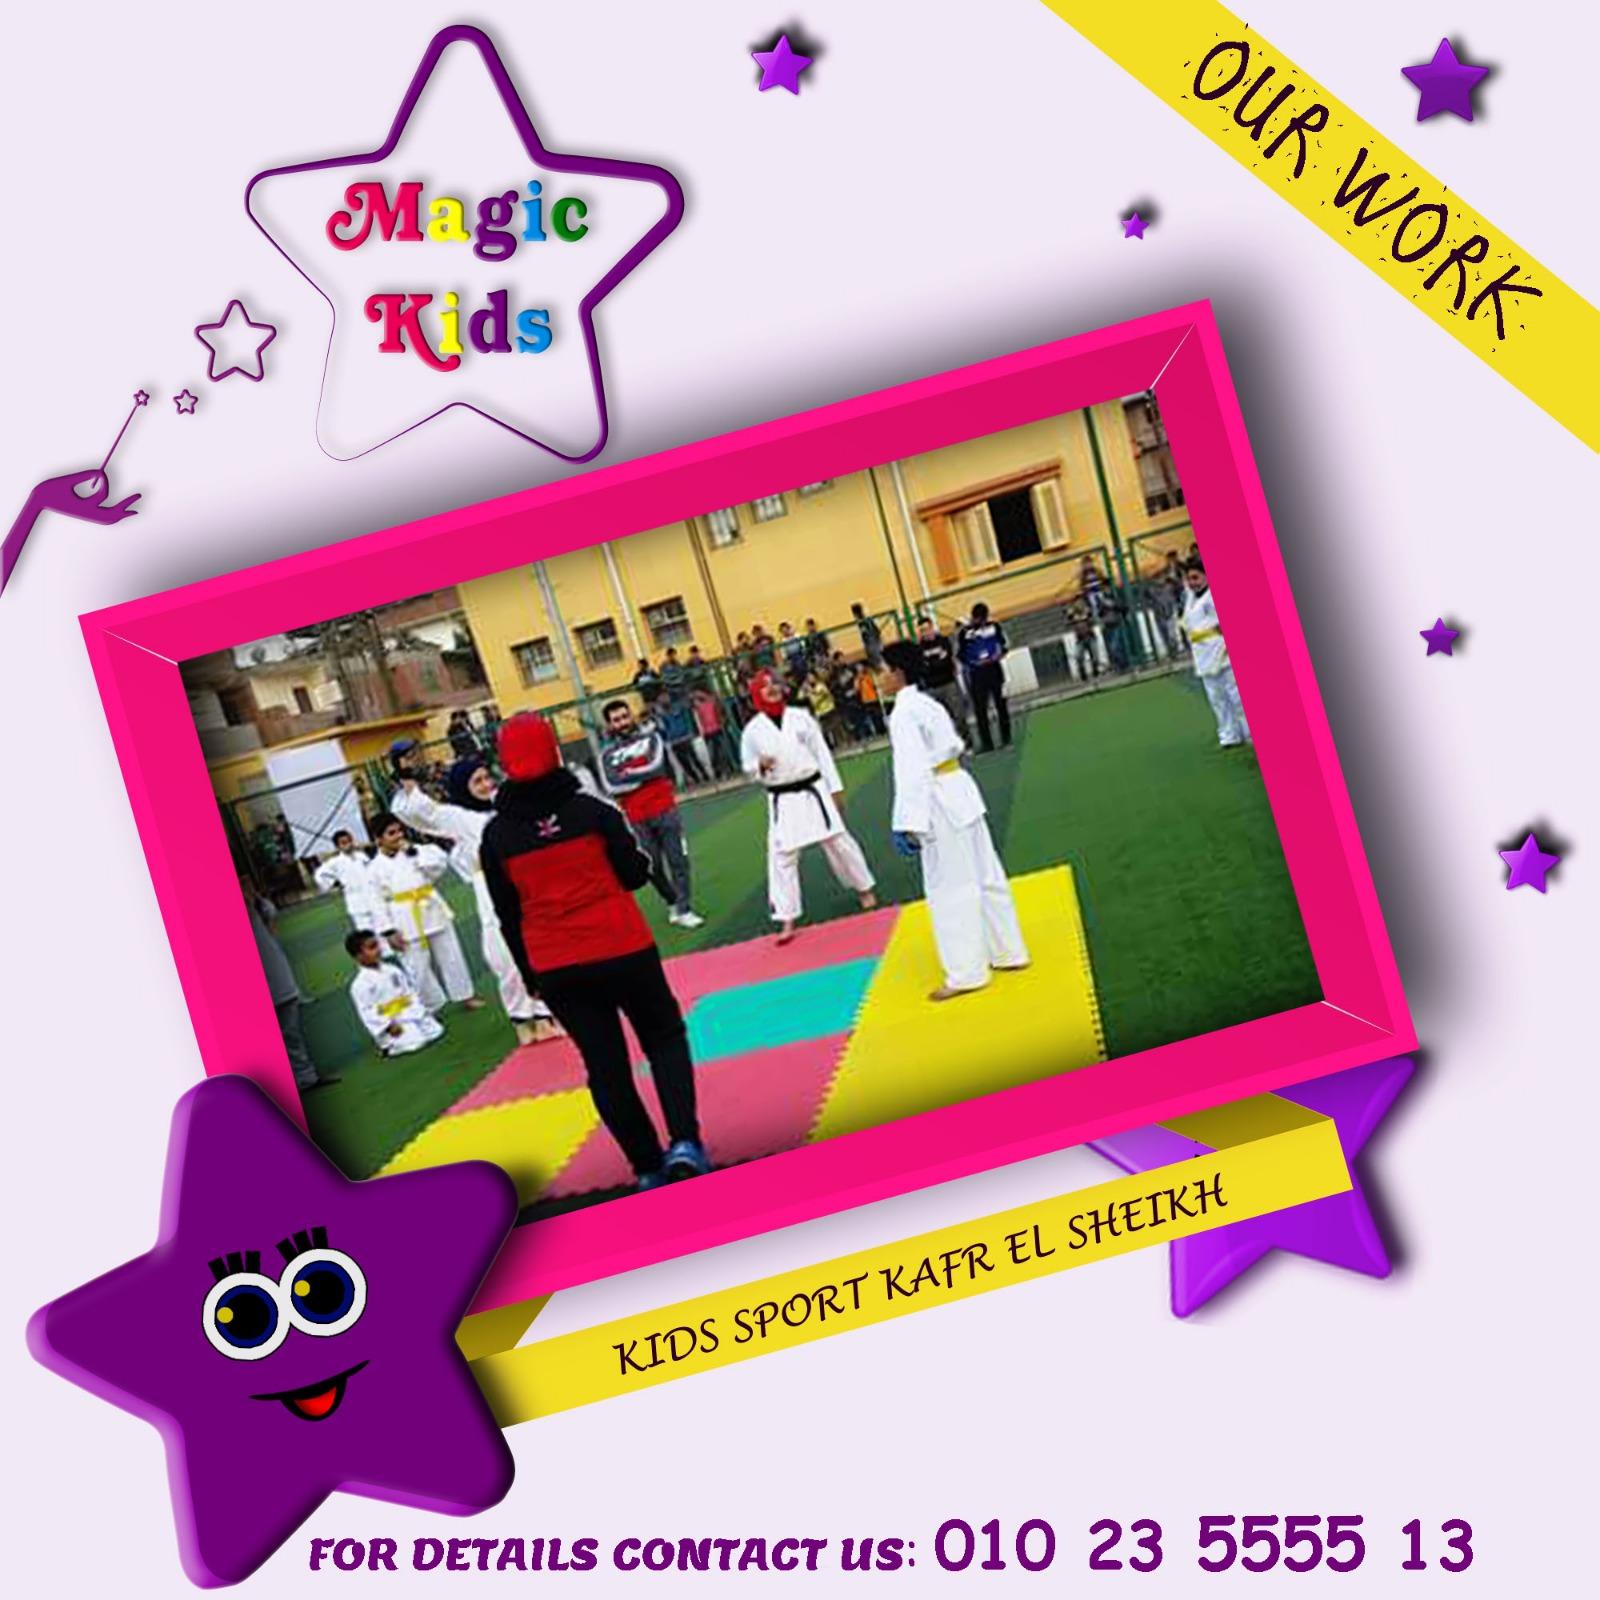 kids sports kafr elshiekh